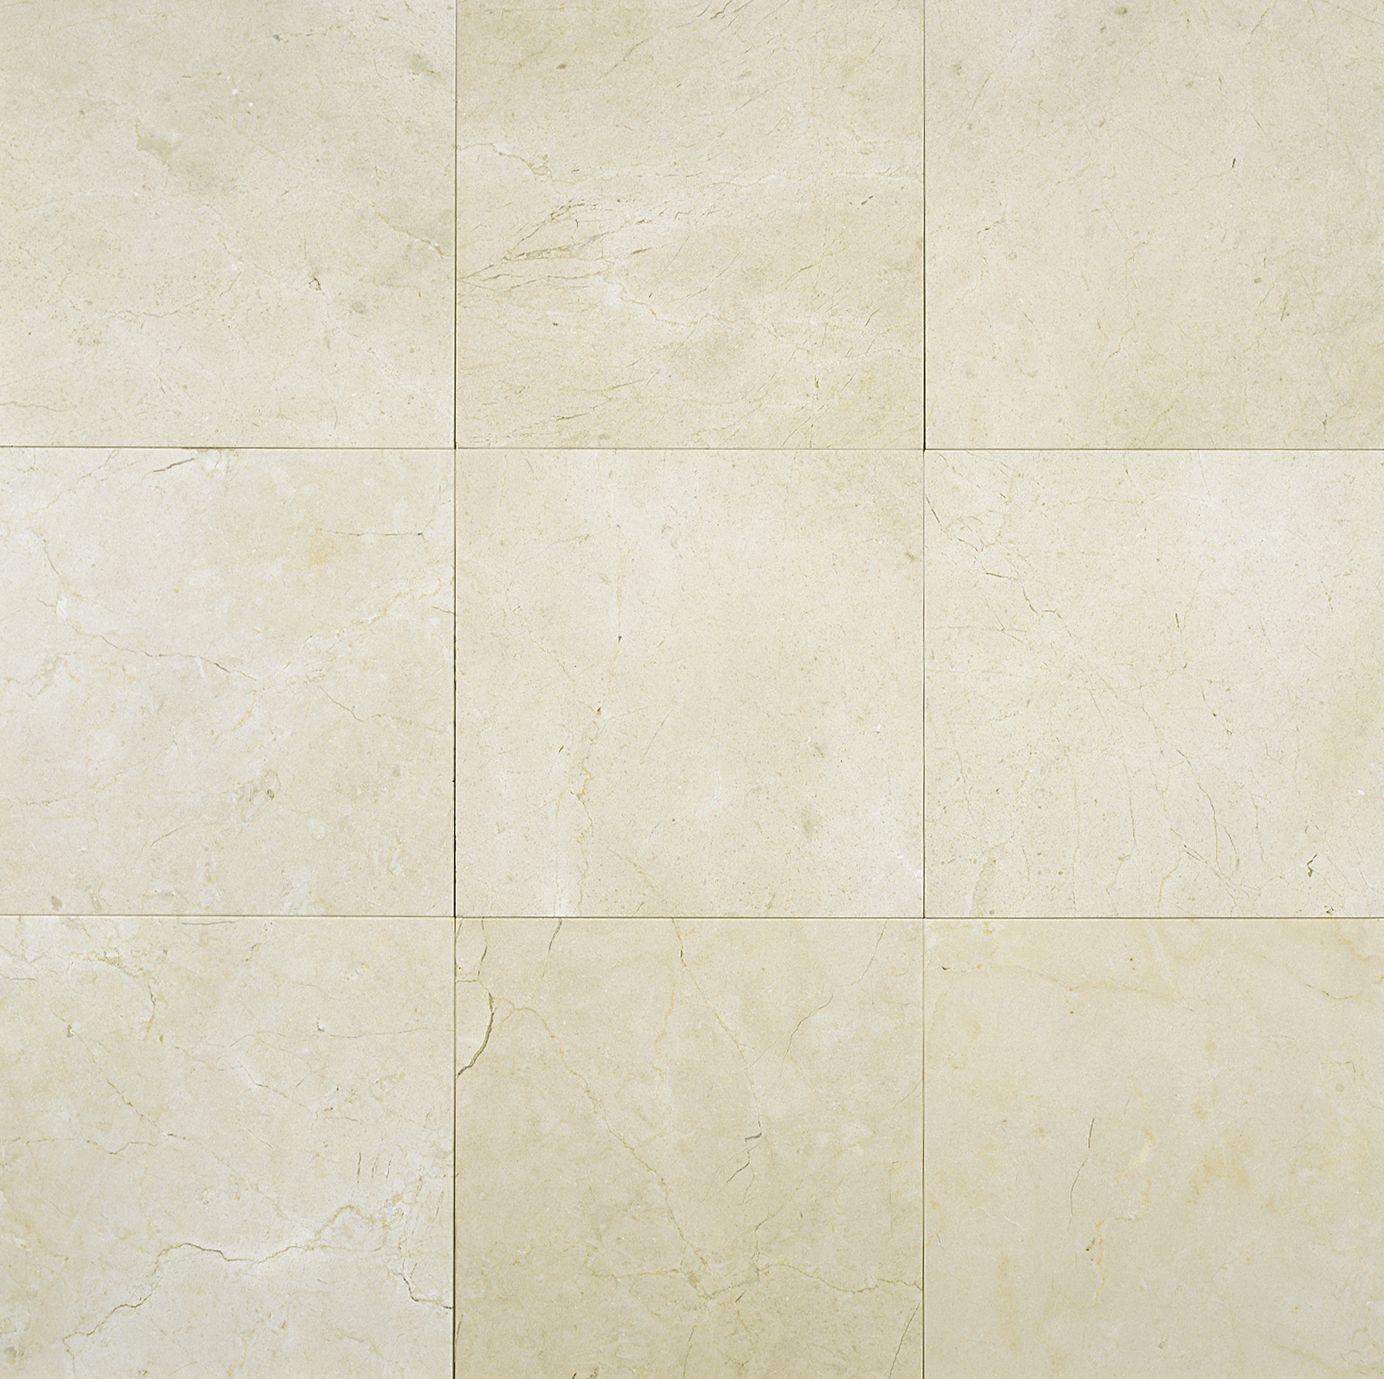 "Crema Marfil Classico 6x6"" Marble Tile Polished ..."